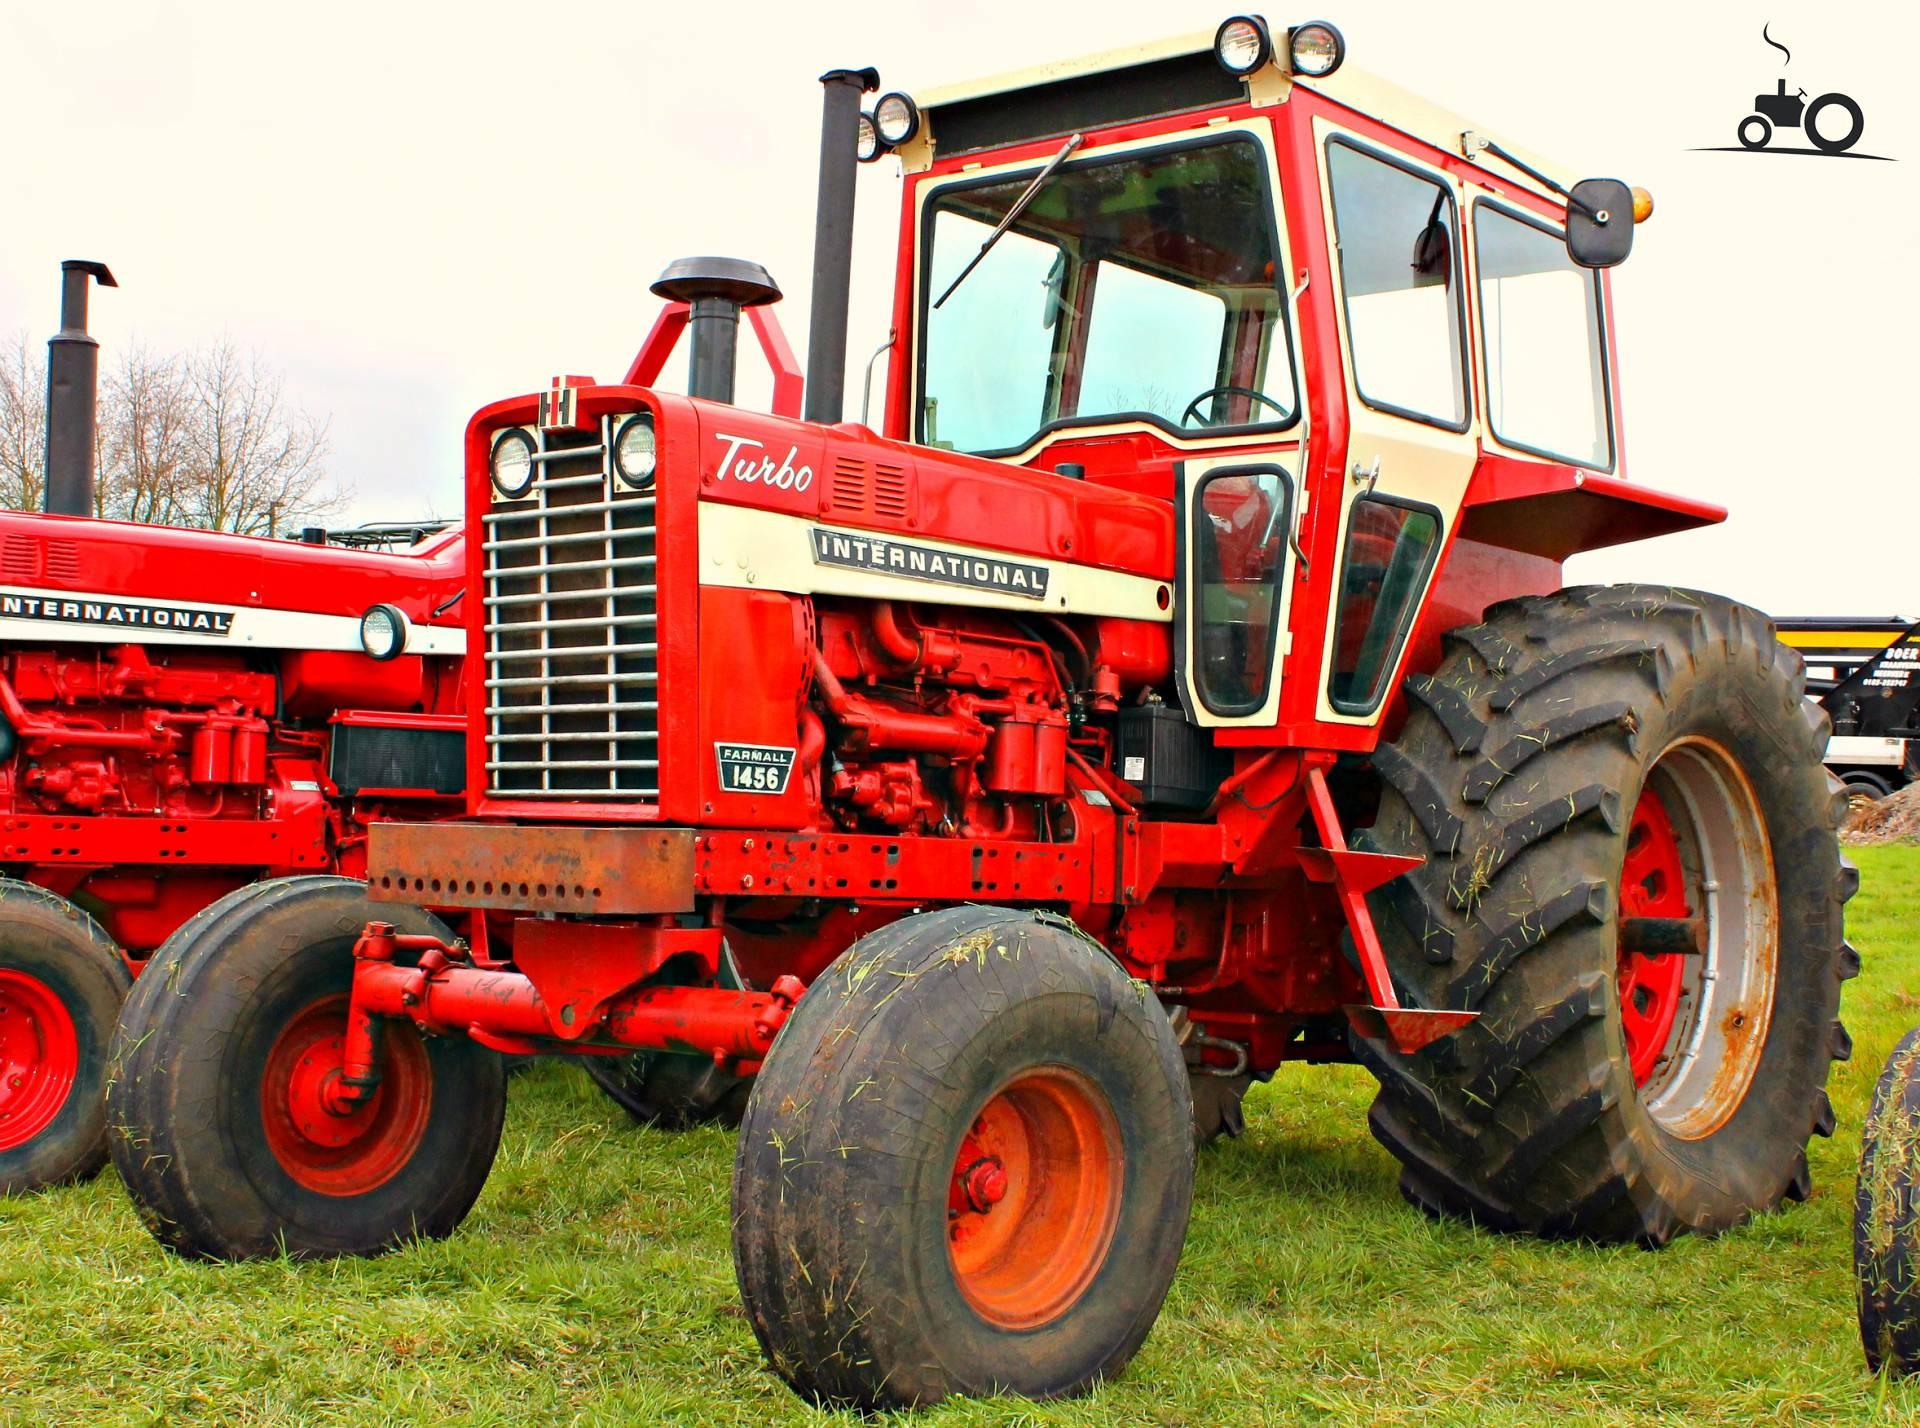 Ih 1456 Tractor : International sale autos we